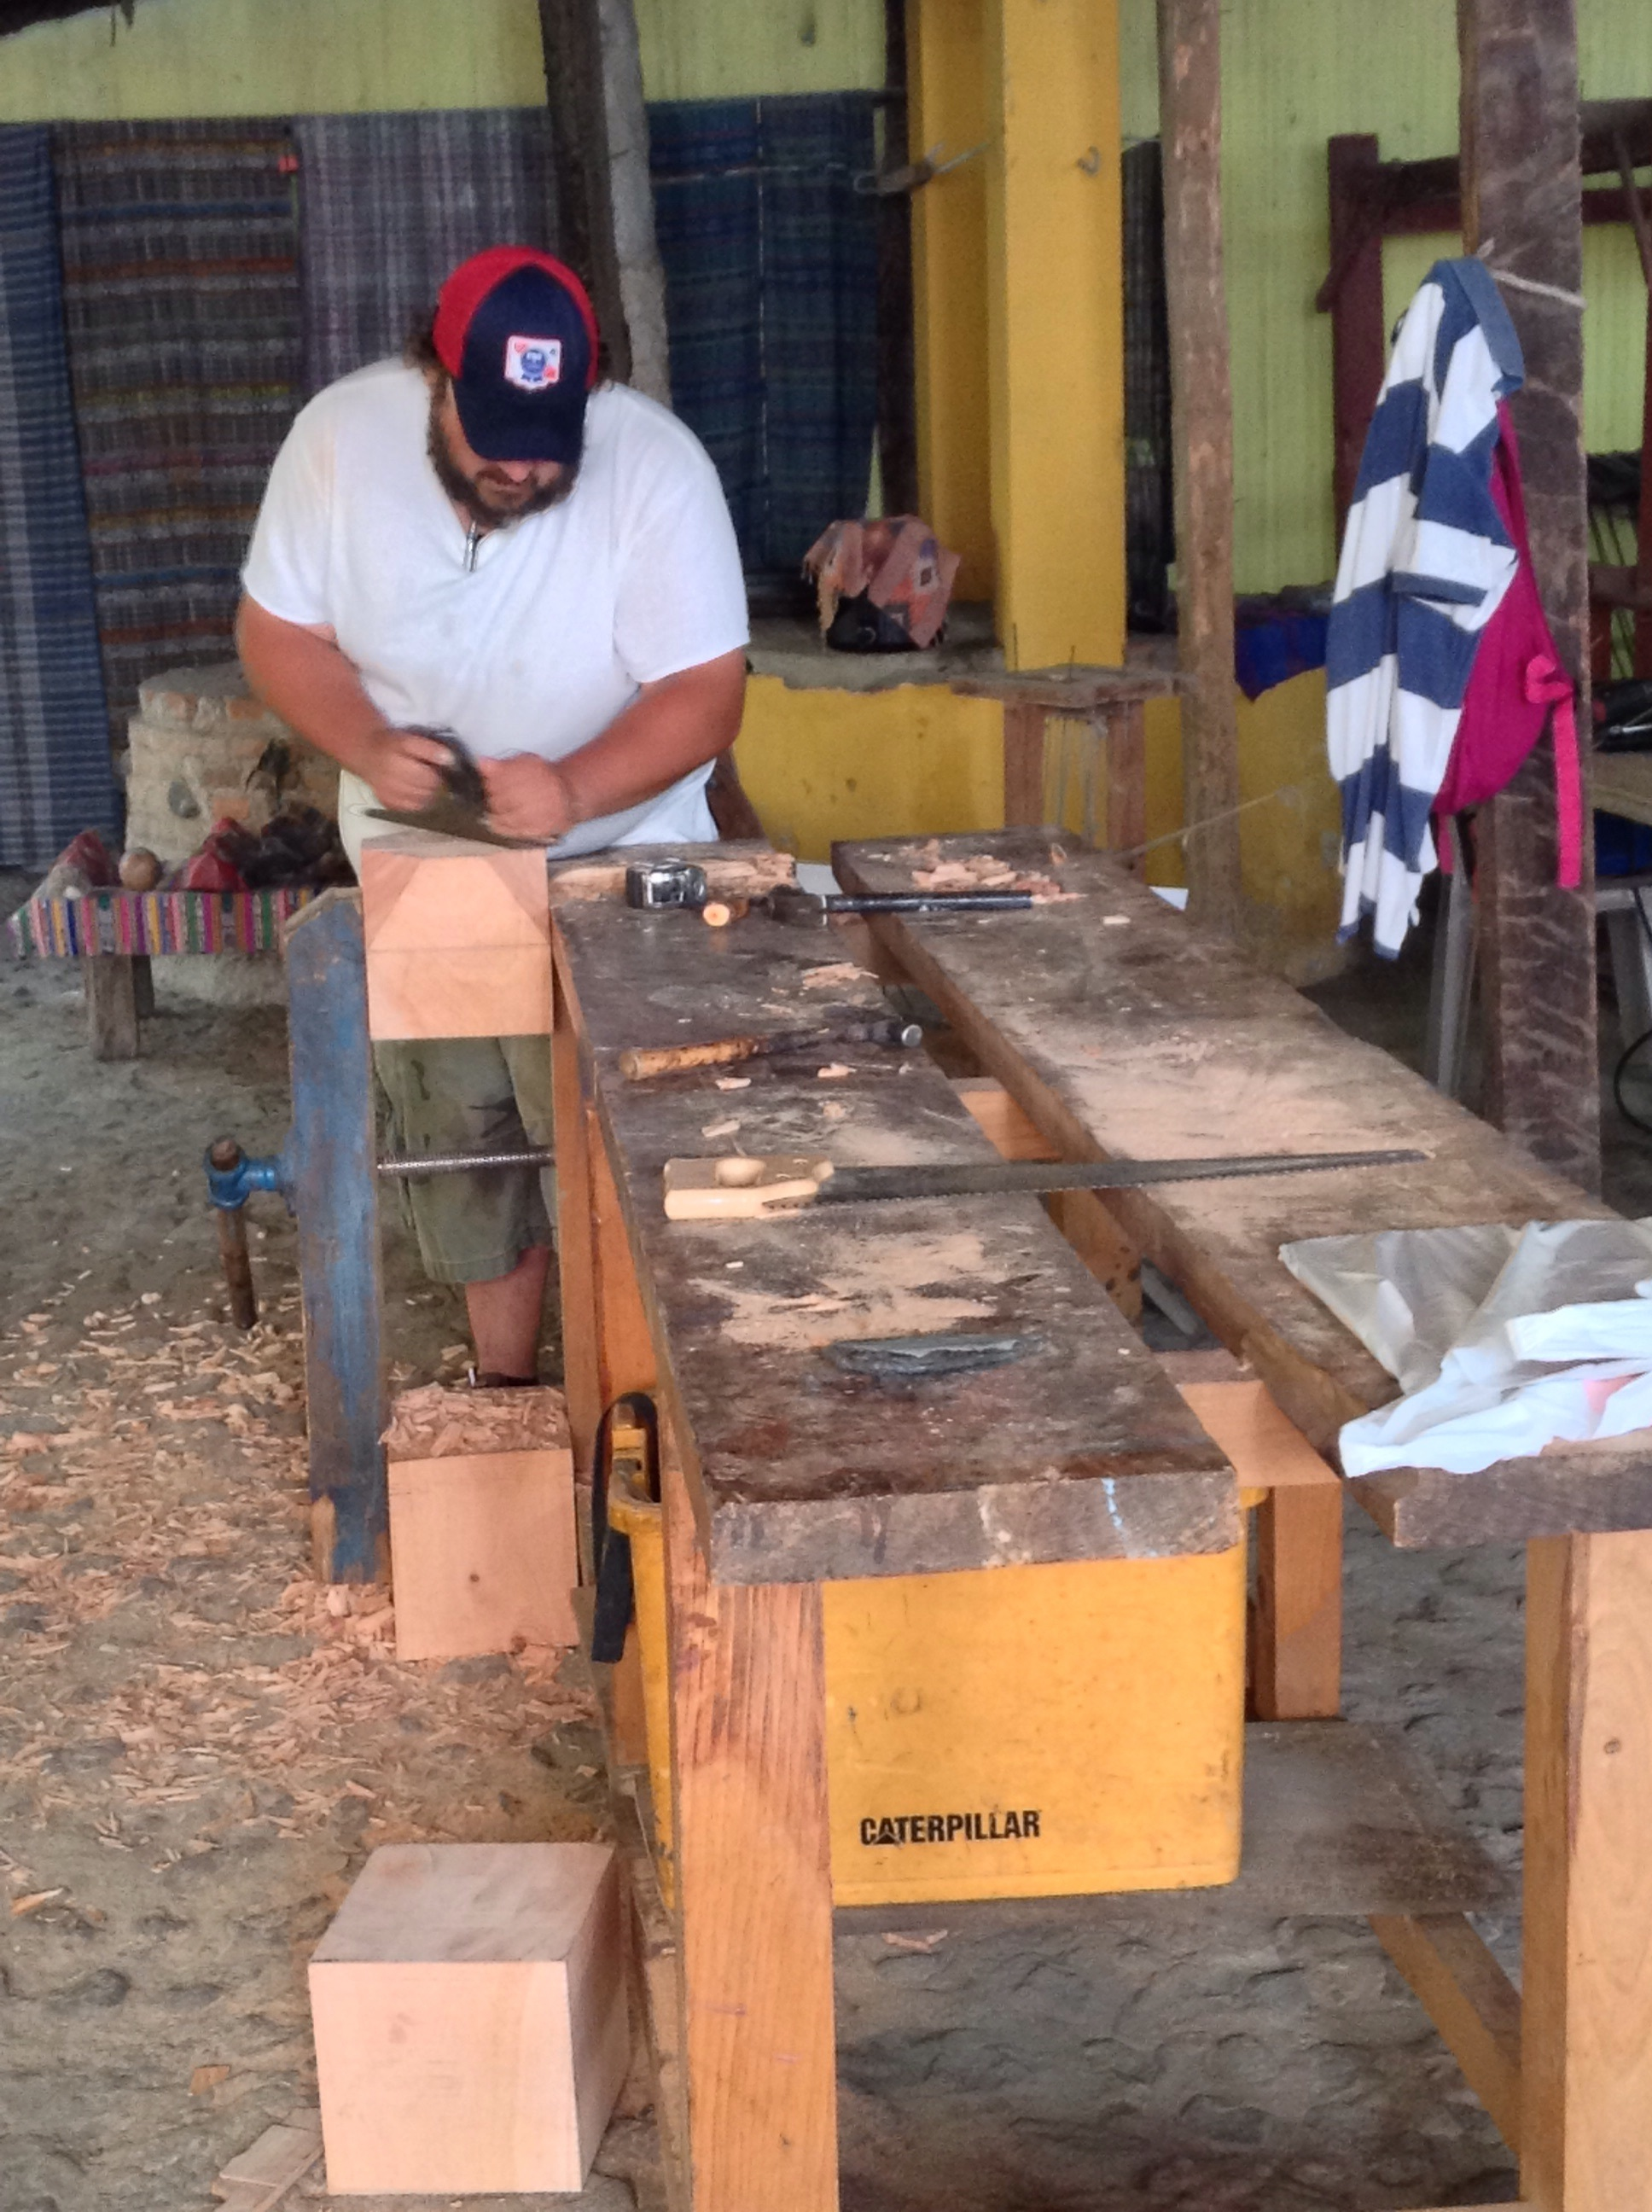 Joshua Knoblick working with wood.